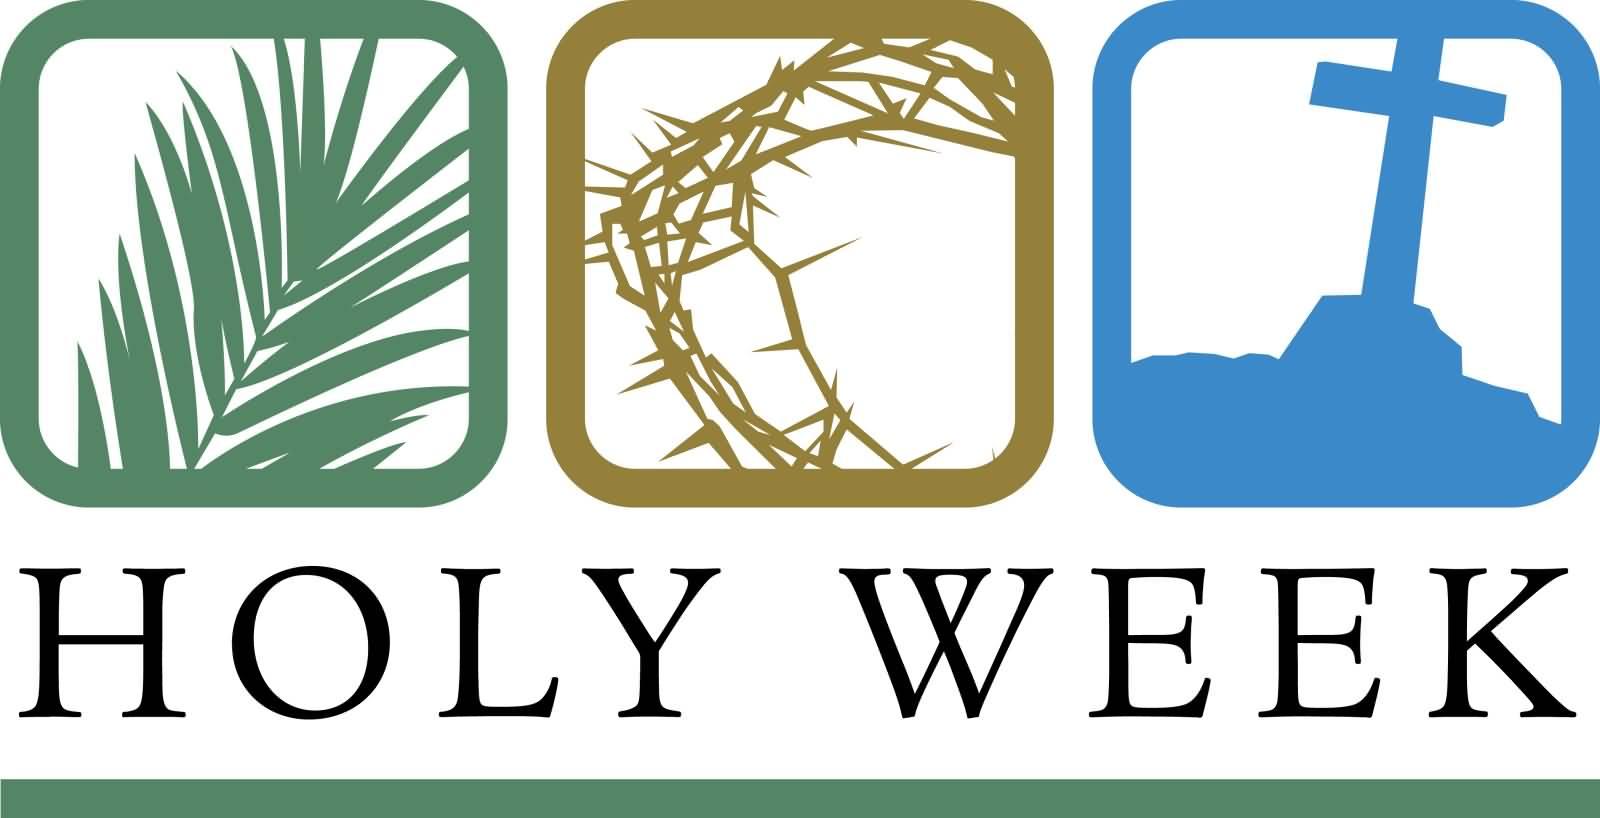 holy week clipart rh askideas com holy week clipart free holy week clip art free